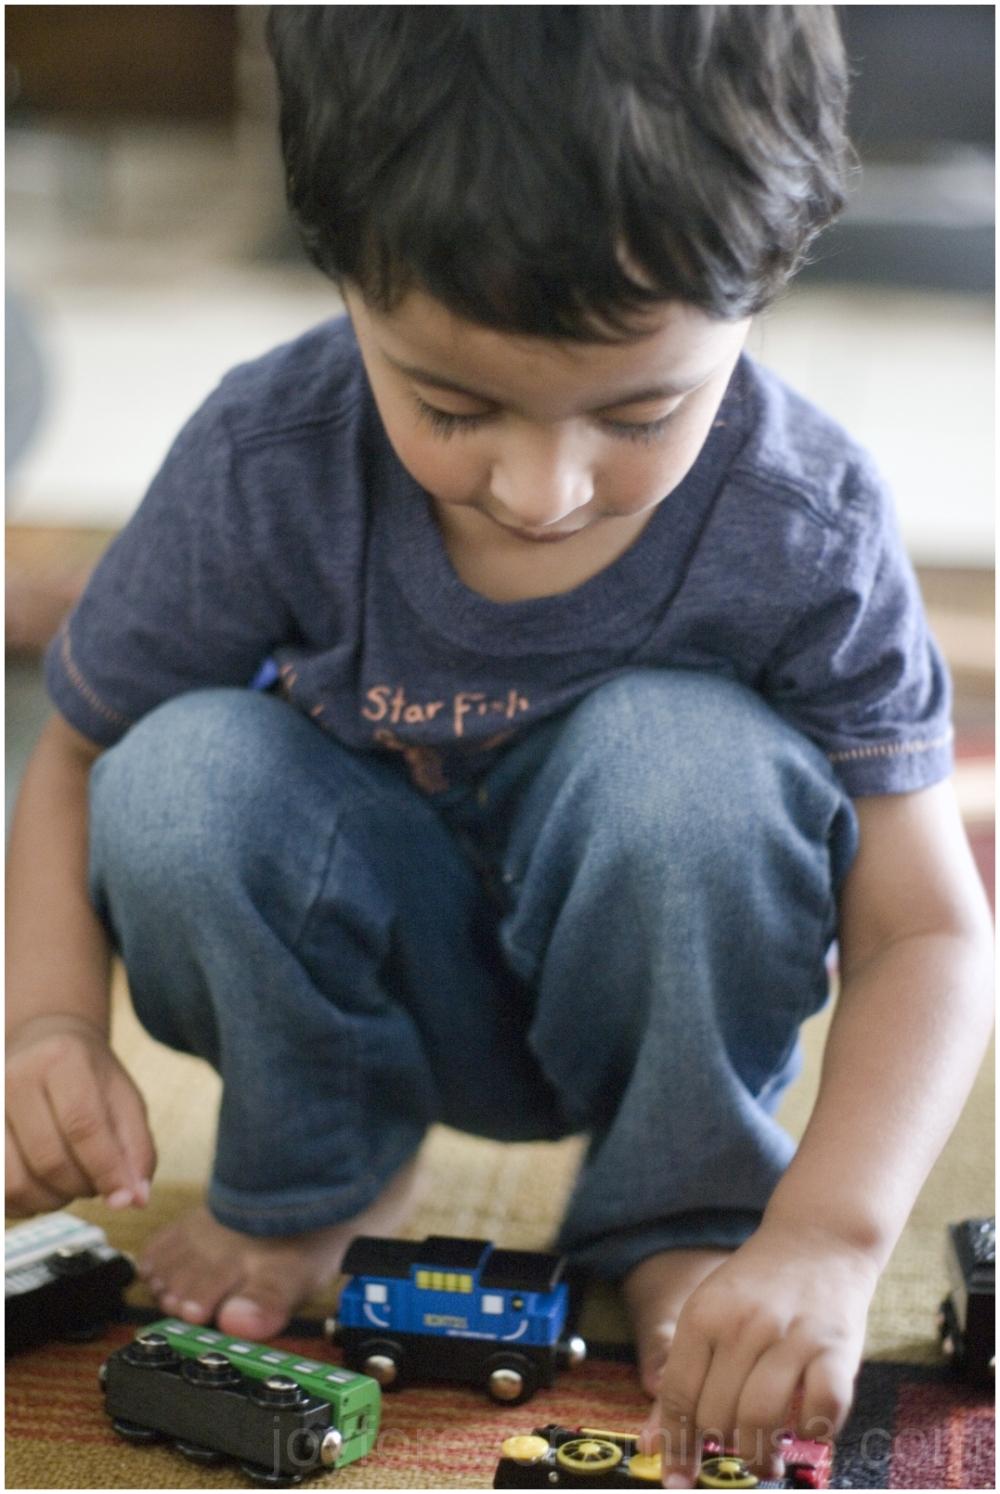 Arjo child boy play toy train blue